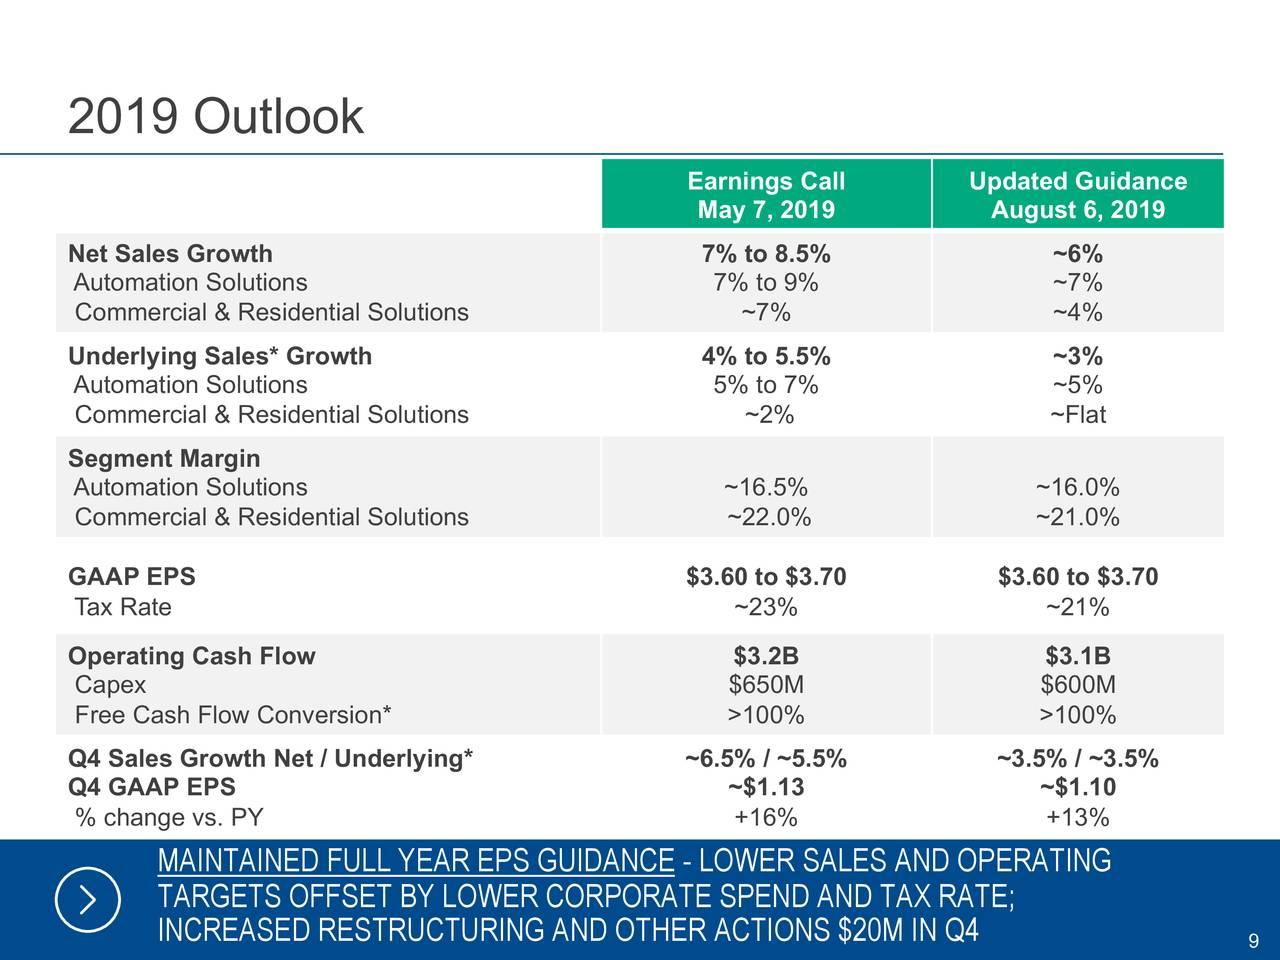 Emerson Electric Stock Price...